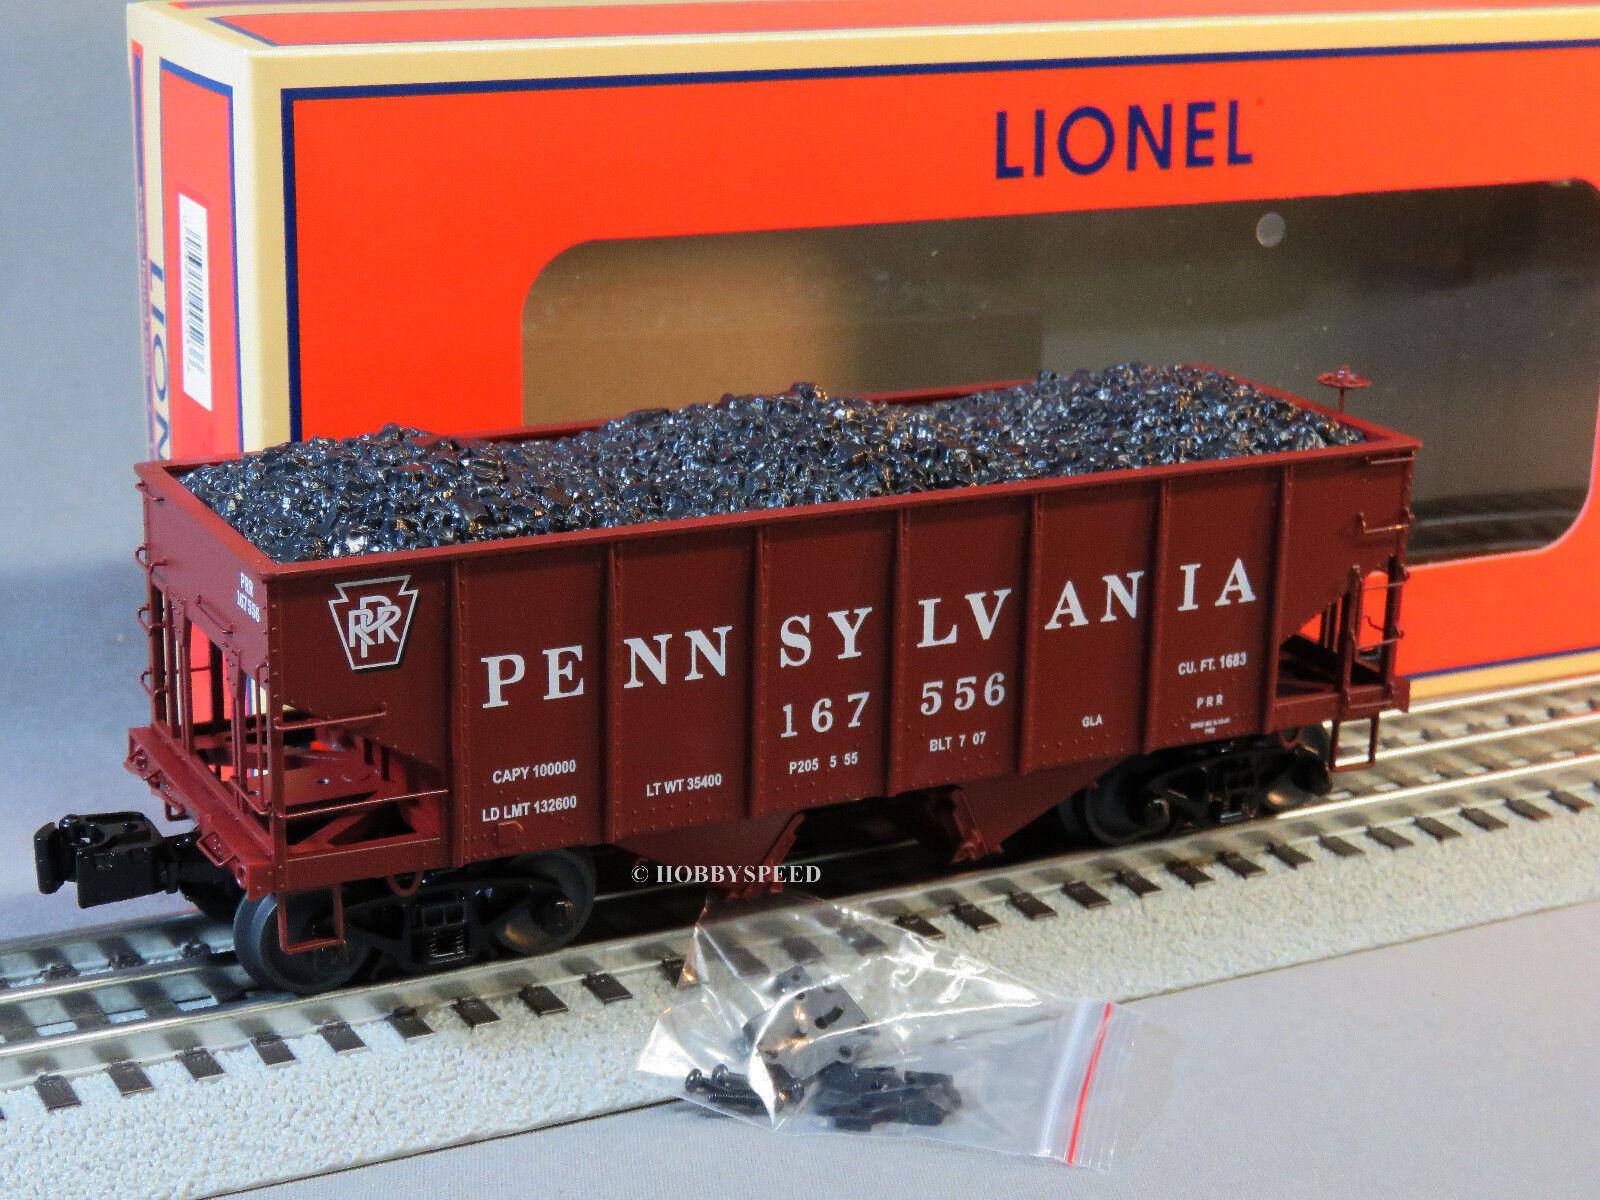 LIONEL PRR SCALE 50 TON TWIN HOPPER 167556 6-81858  train car o gauge 6-81860